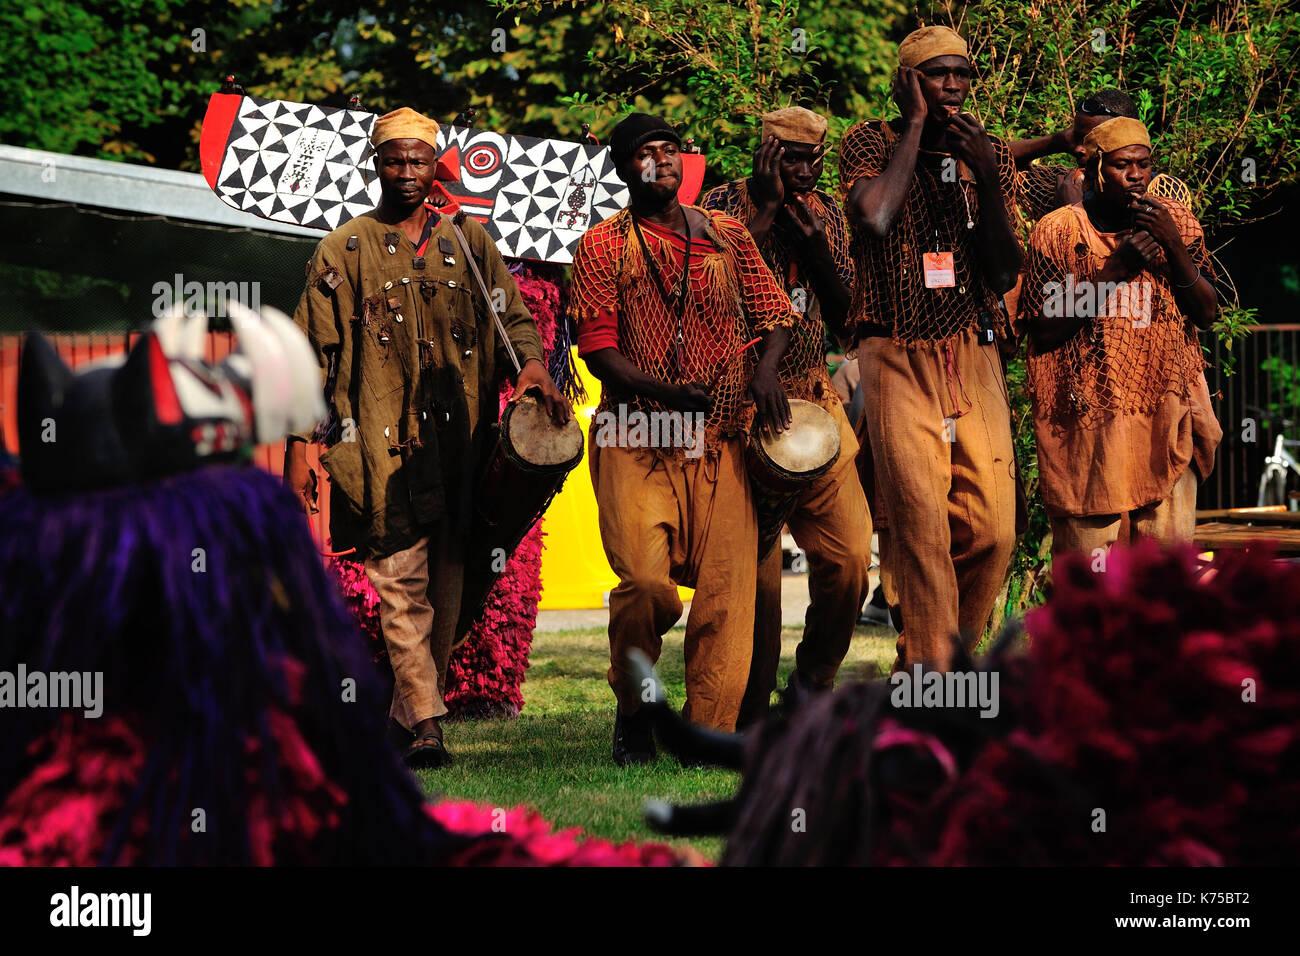 Wicked Masks of Burkina Faso, Nuna, Africa, Ethnography, Hermetic, people, ritual, - Stock Image